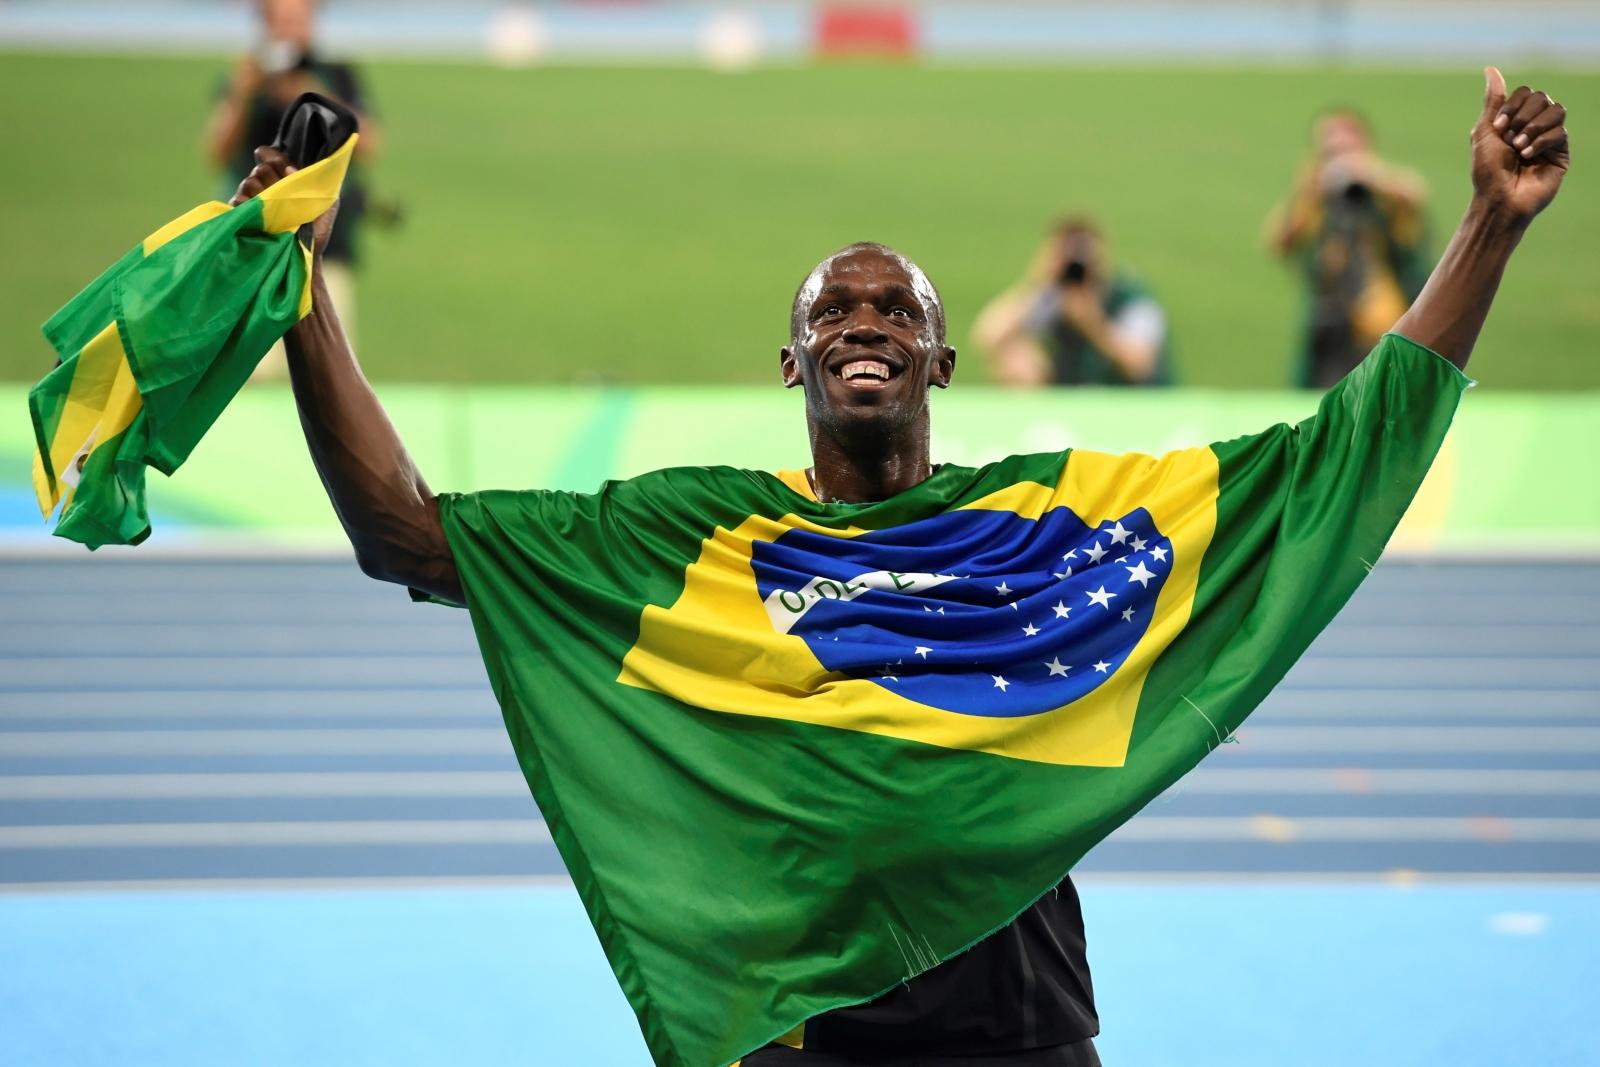 rio 2016 olympics usain bolt wins ninth gold as team gb